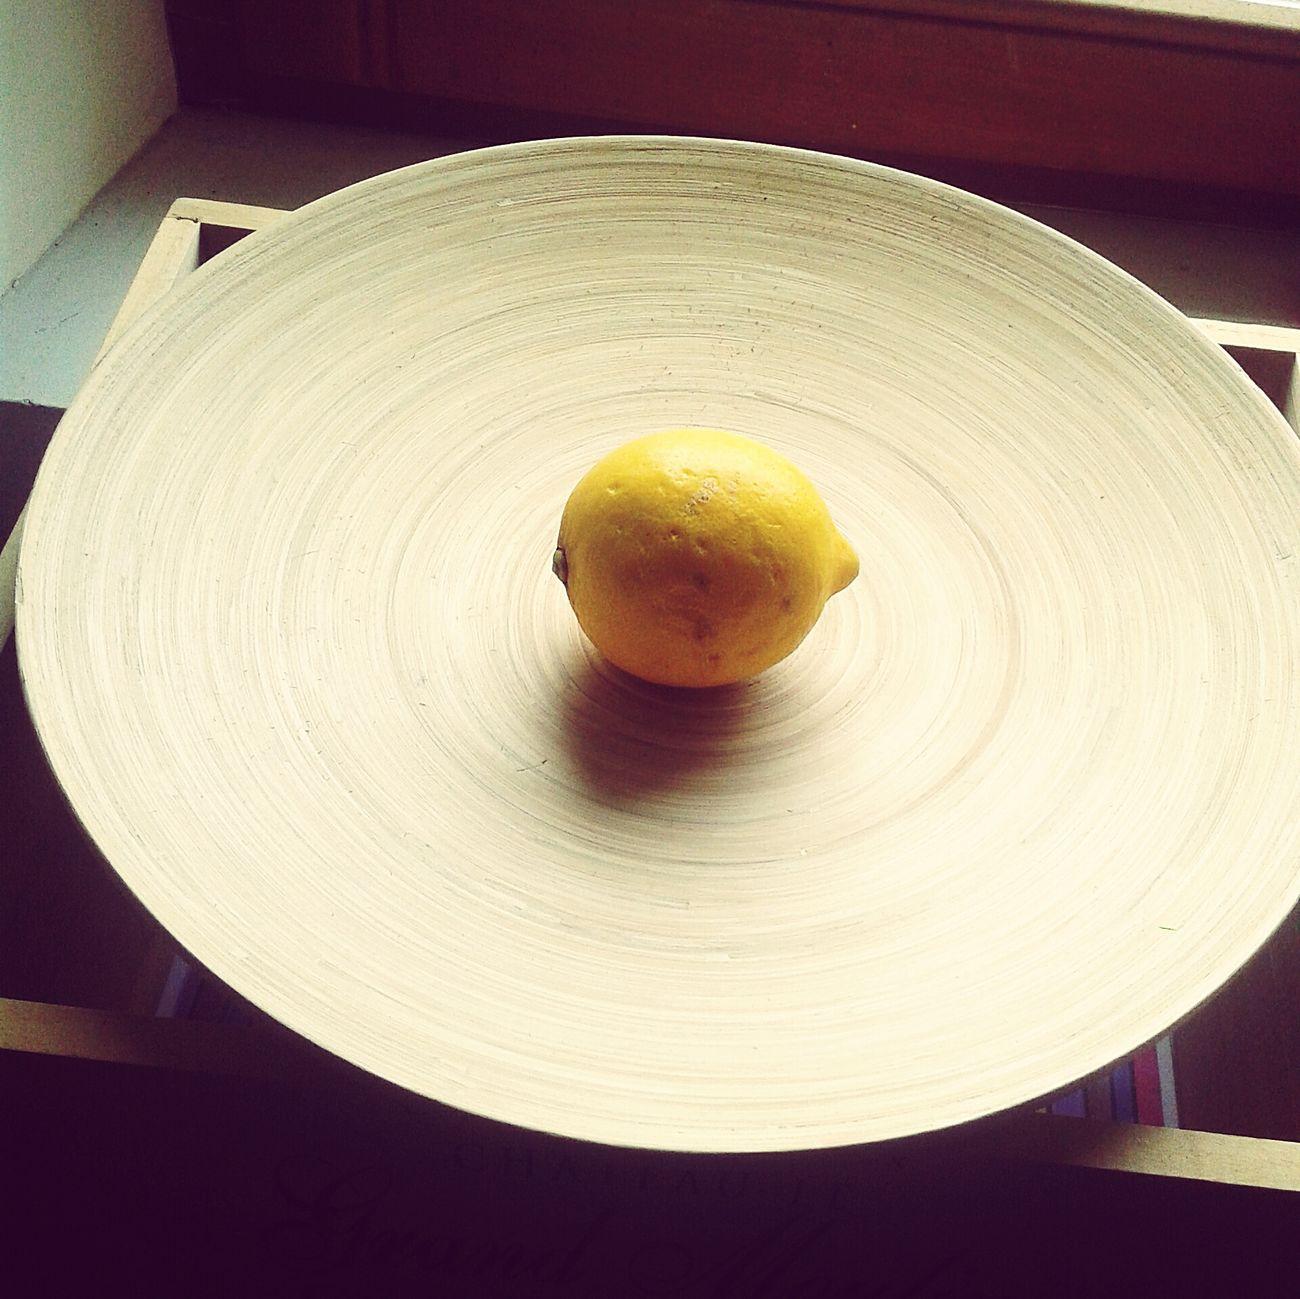 Lemon Lime By Motorola Alone